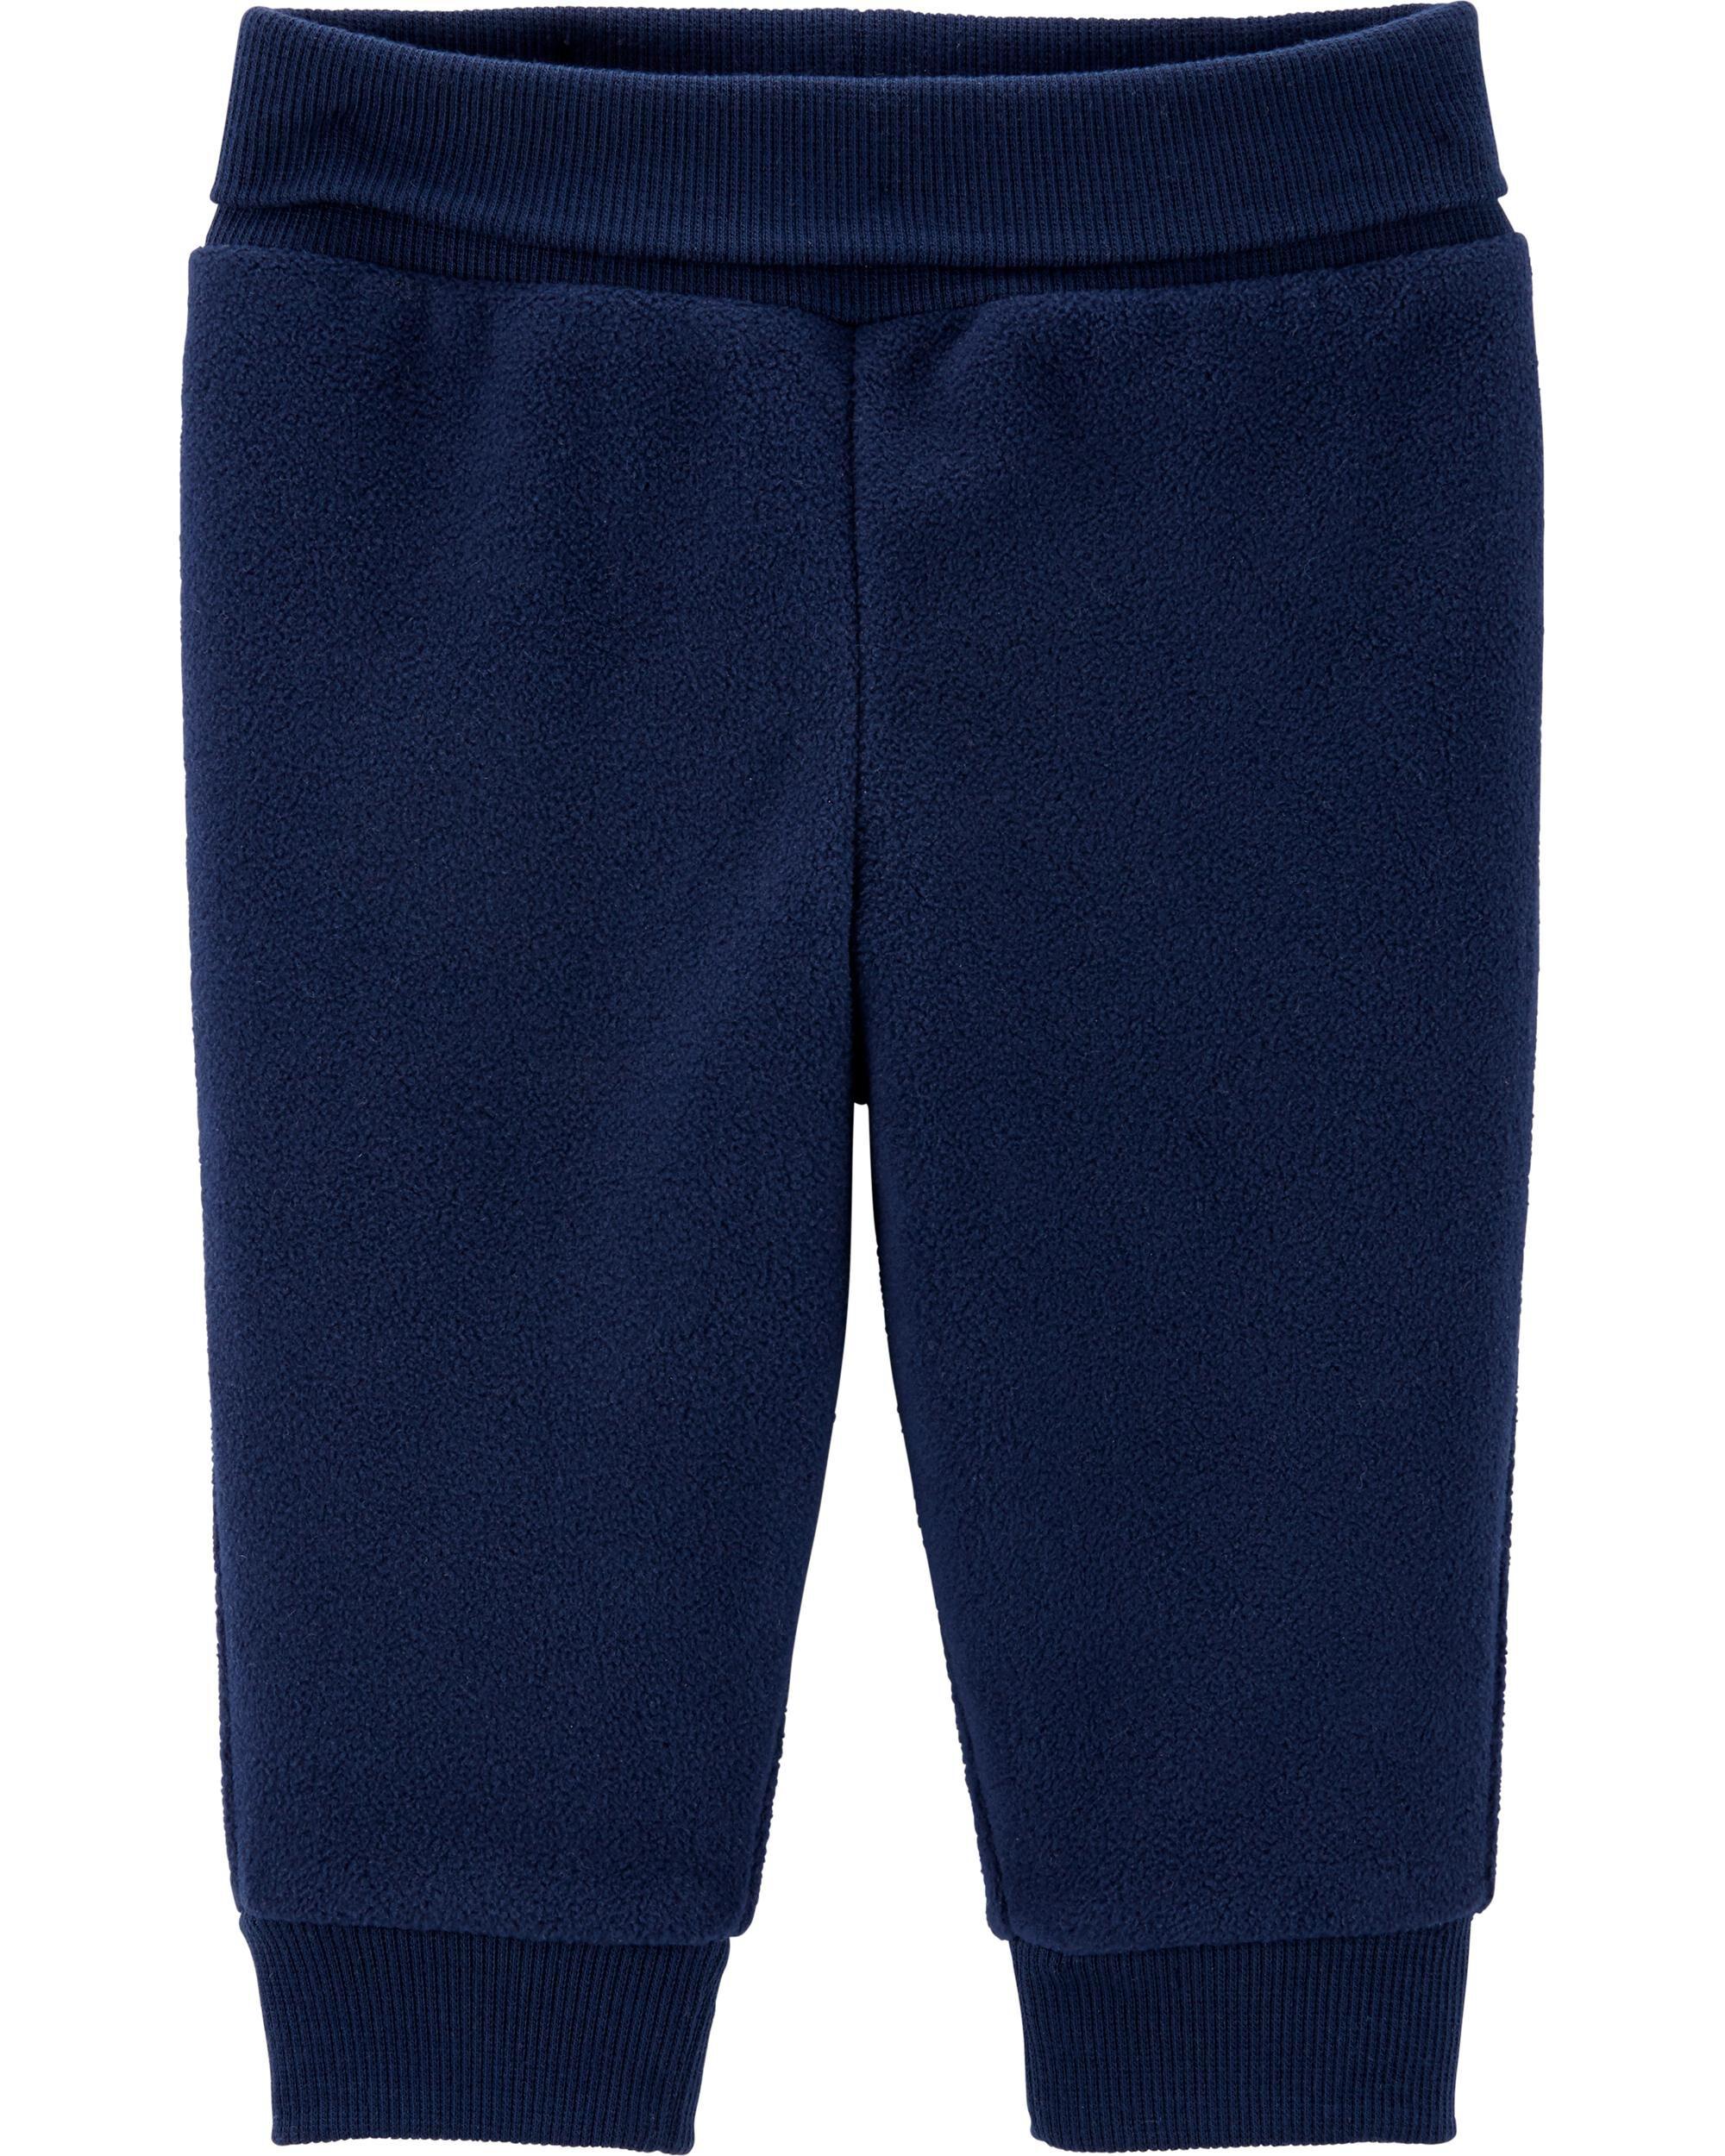 *CLEARANCE* Pull-On Fleece Pants